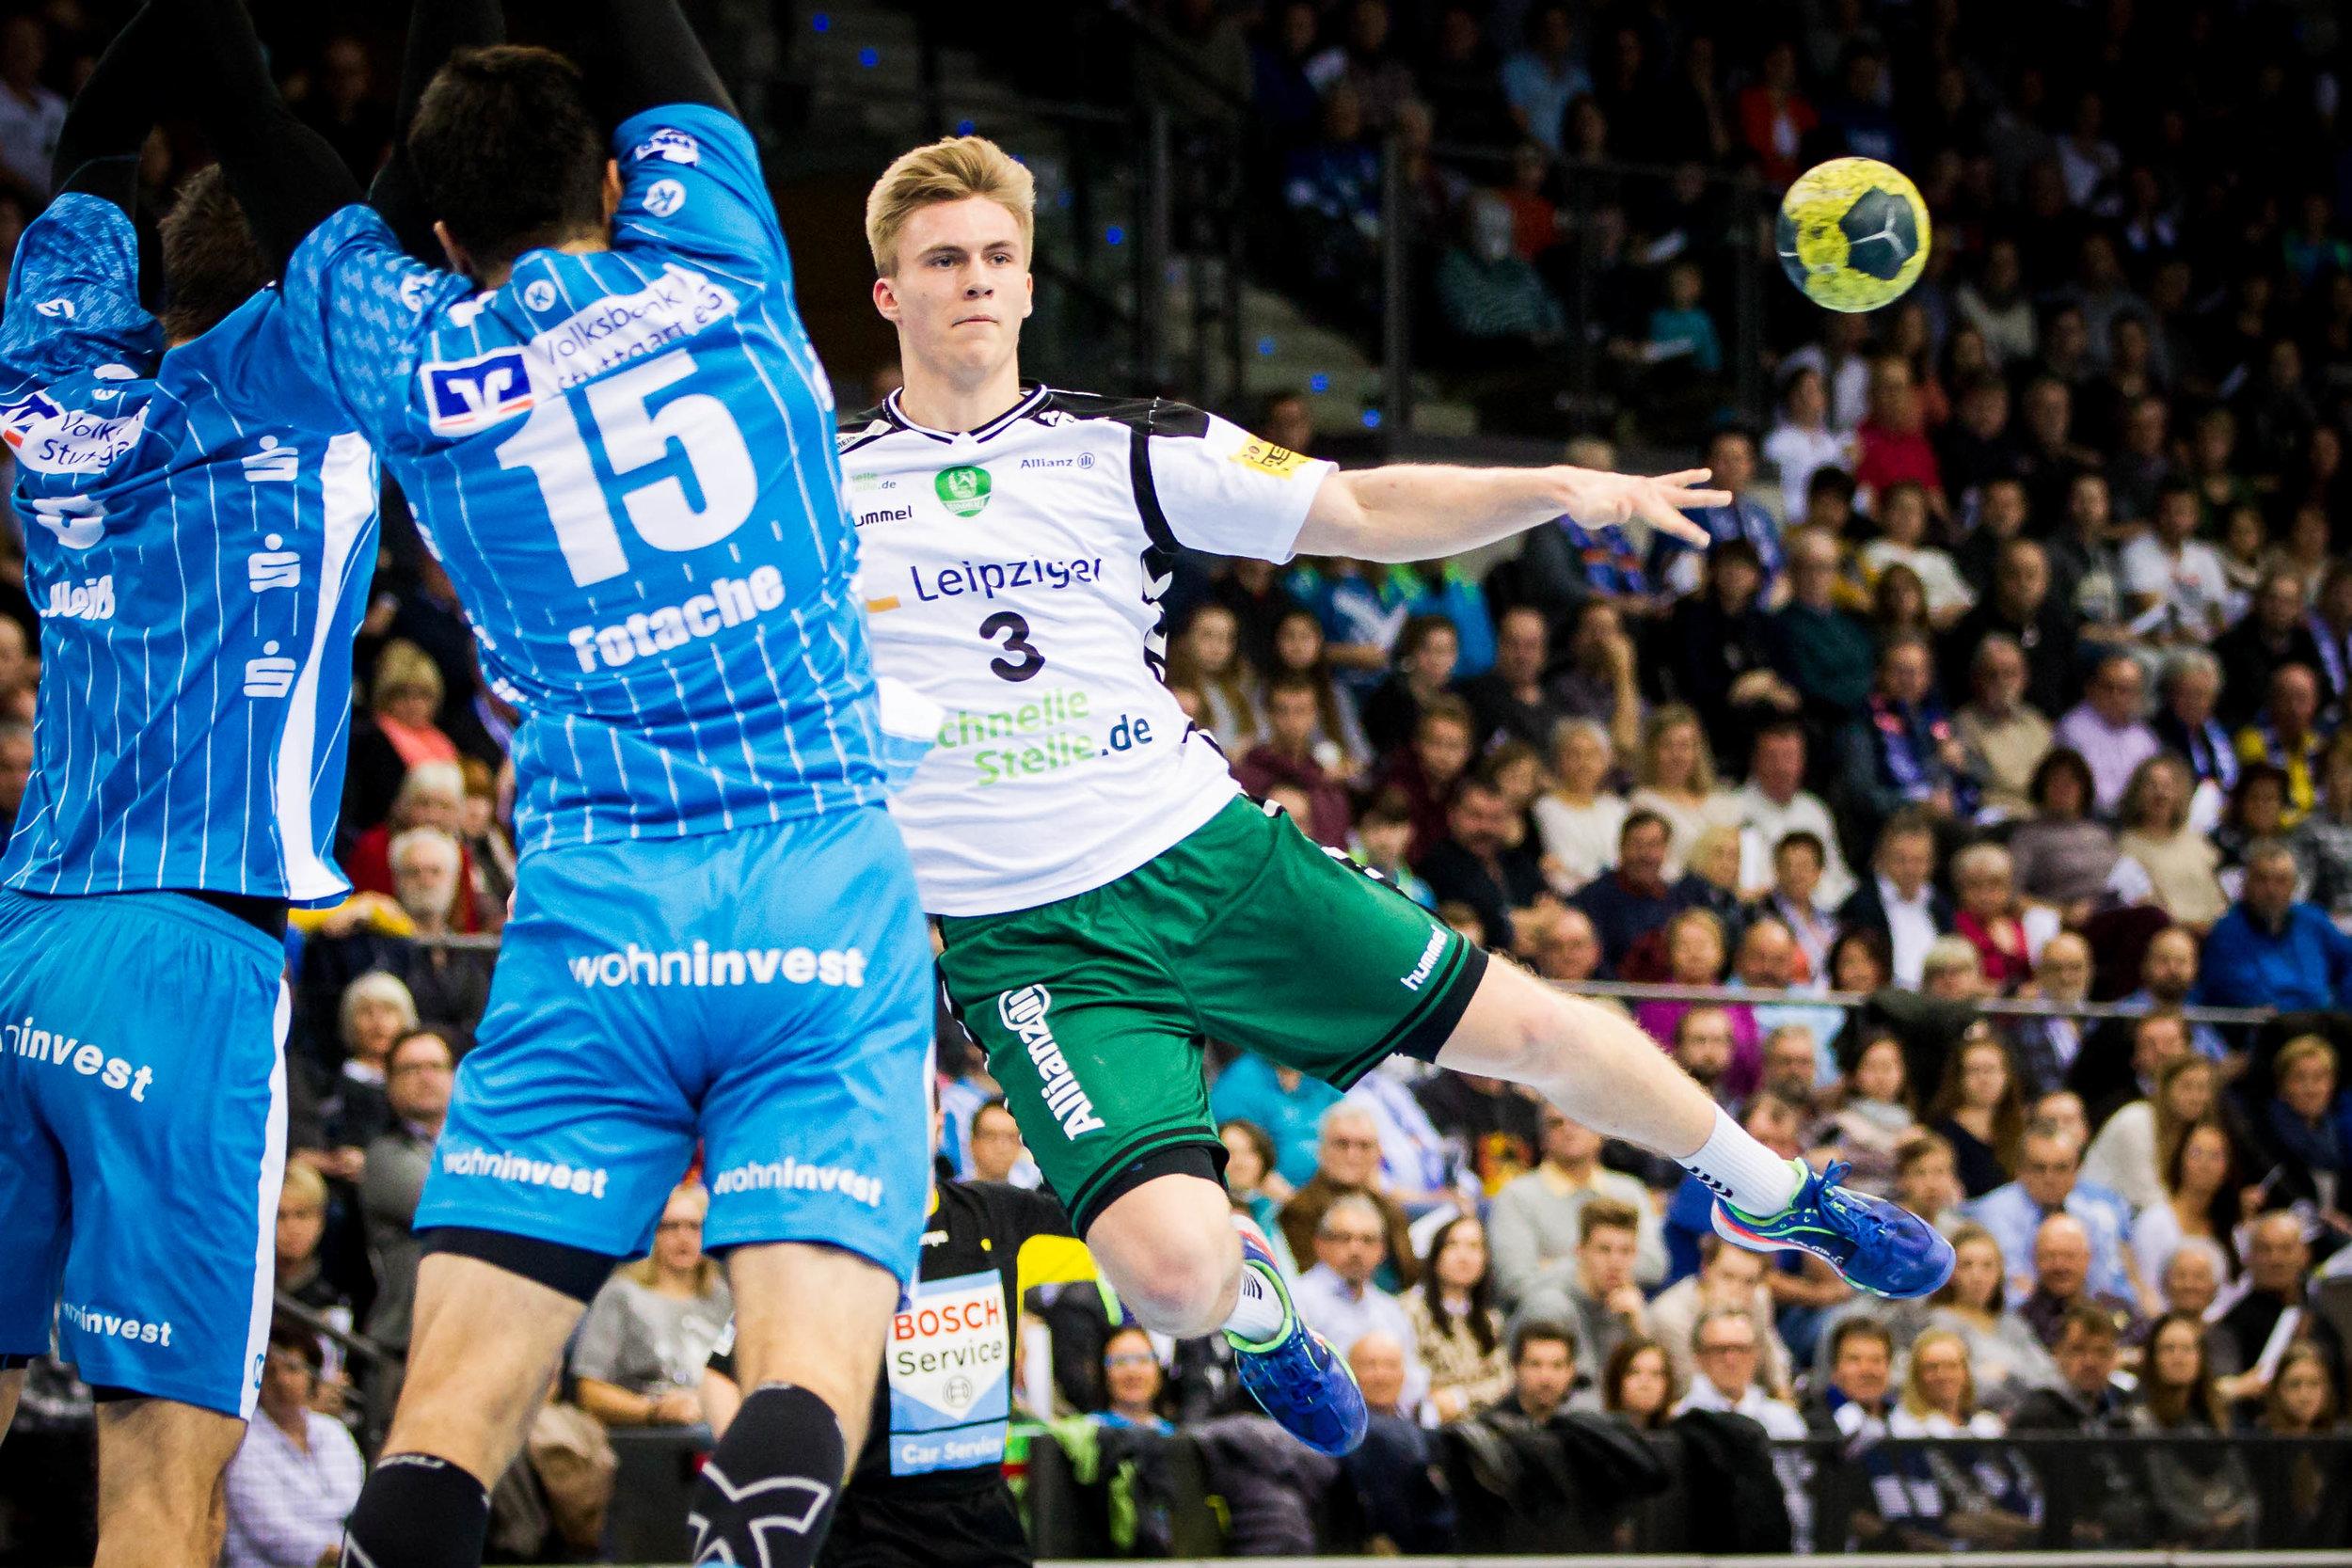 Wurf Franz Semper (3 Leipzig); DKB Handball Bundesliga: TVB 1898 Stuttgart vs SC DHfK Leipzig, Porsche Arena, Stuttgart Germany, 20161226; Foto: Wuechner/Eibner Pressefoto